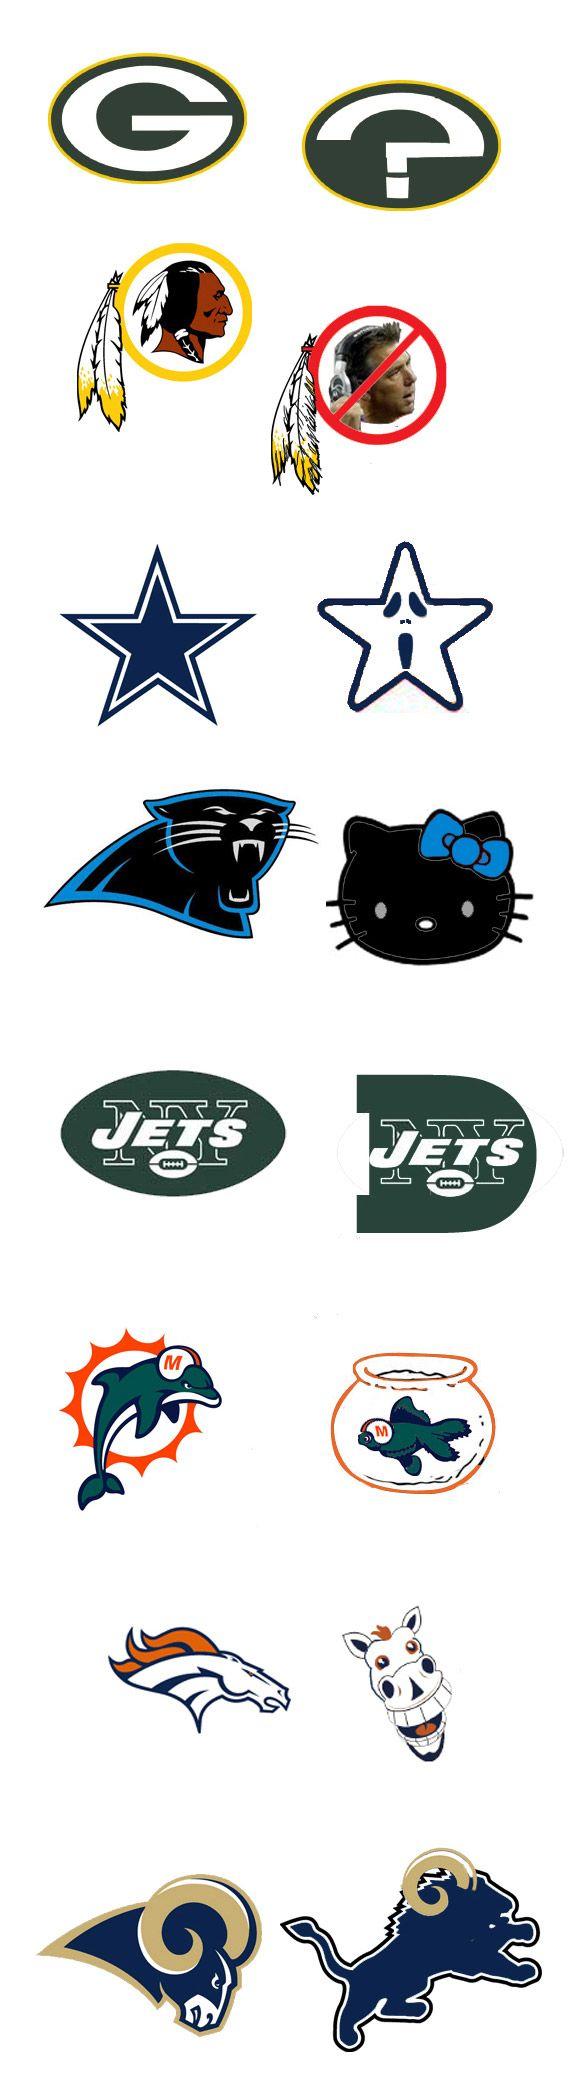 Free Fantasy Football Team Logos : fantasy, football, logos, Snibbe:, Suggested, Logos, (Part, Fantasy, Football, Logos,, Logo,, Funny